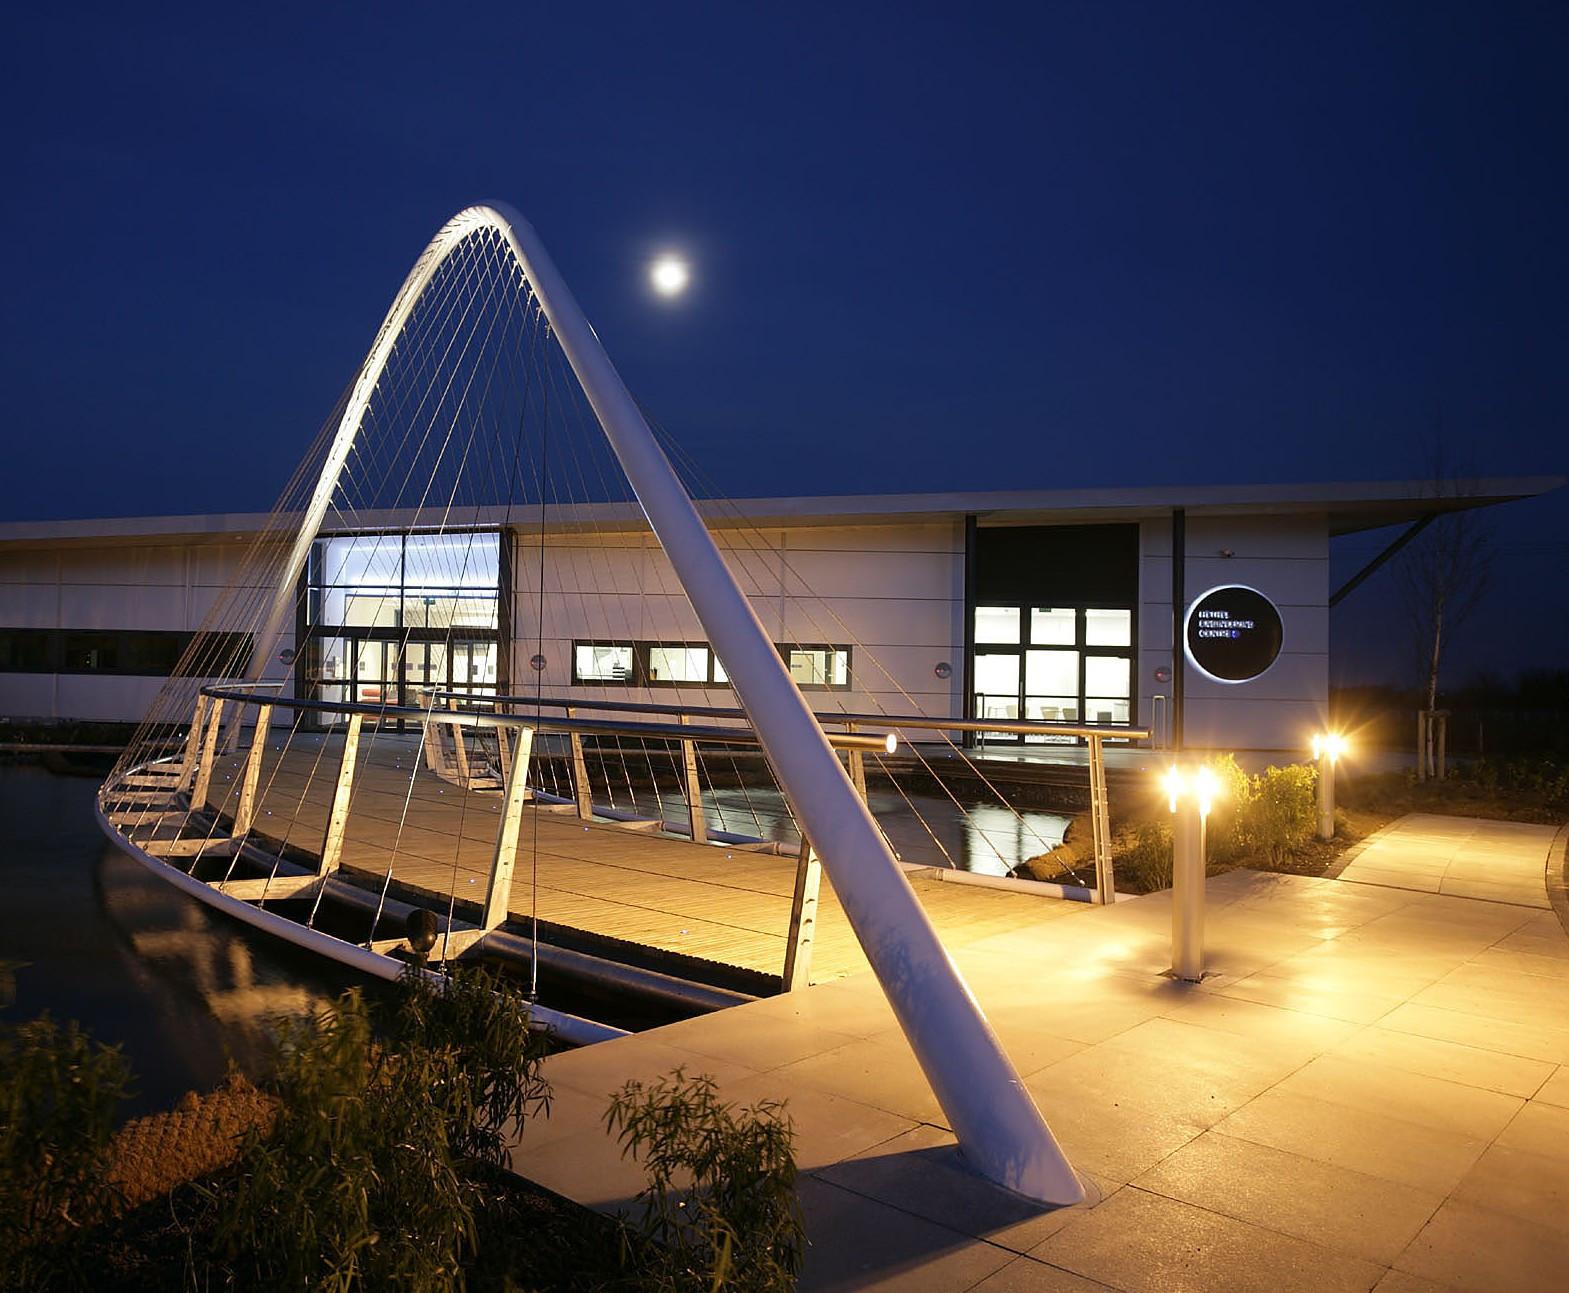 Hethel Engineering Centre, near Norwich